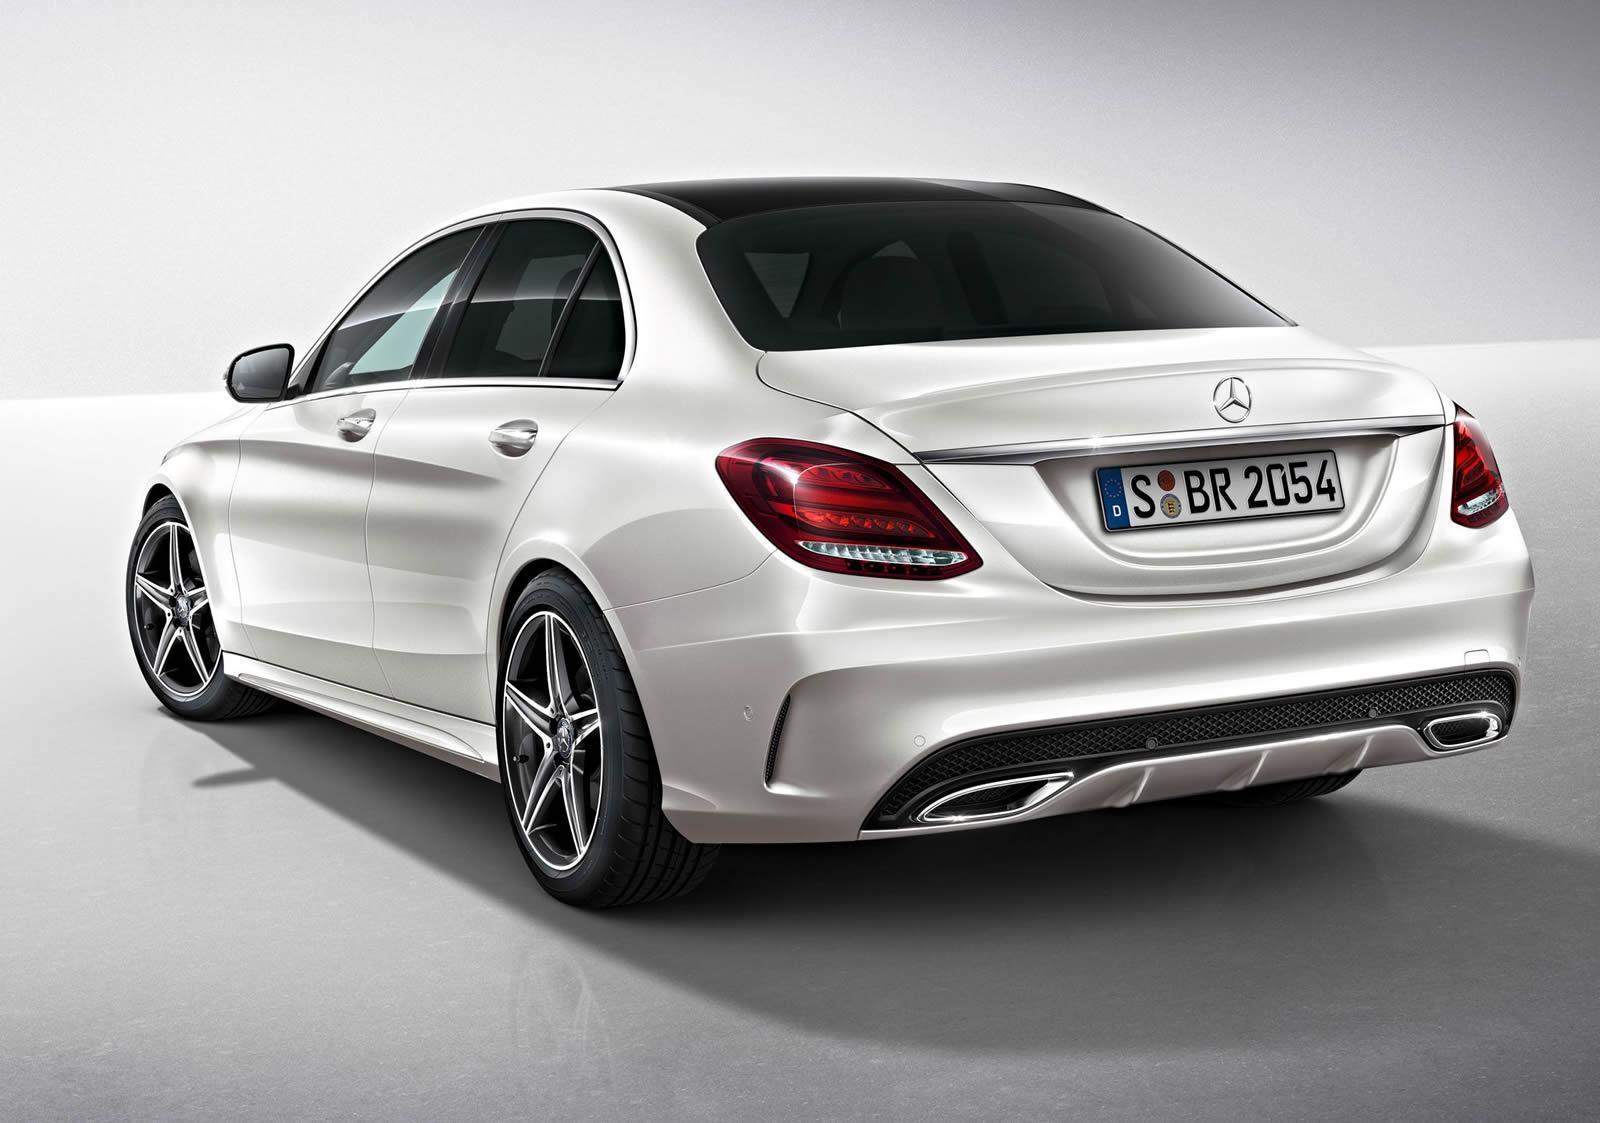 Mercedes benz clase c 2014 paquete amg 4 4 for Mercedes benz clase c